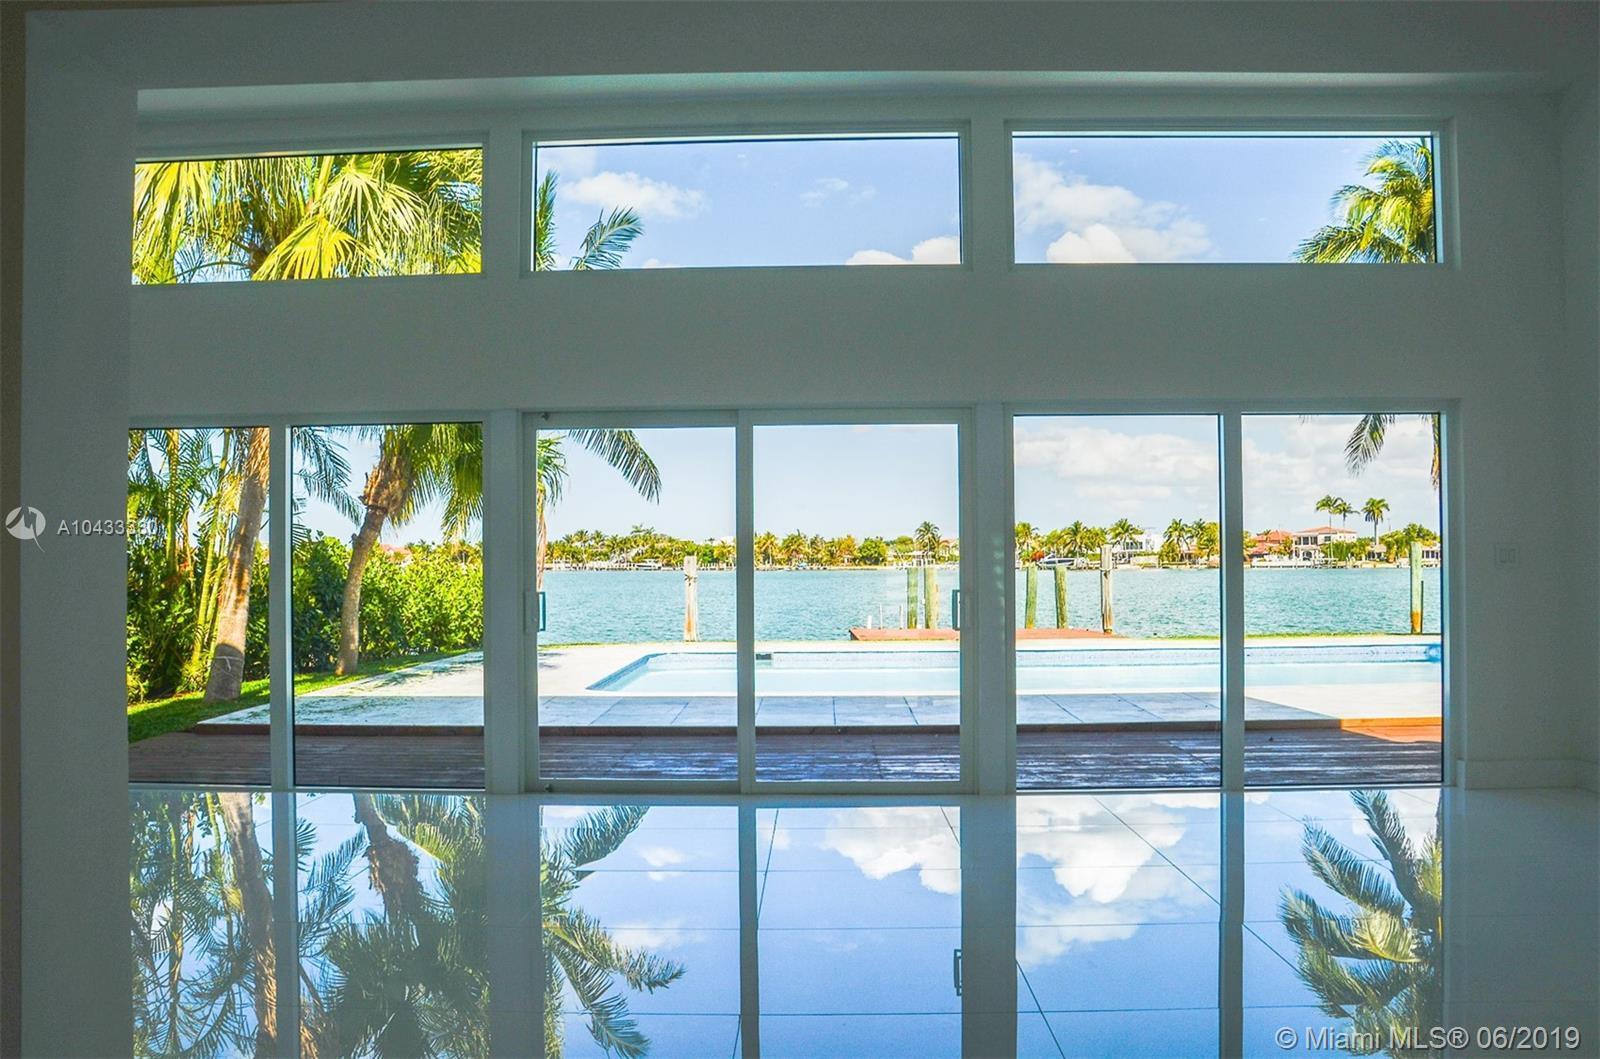 1215 N Biscayne Point Rd, Miami Beach, FL, 33141